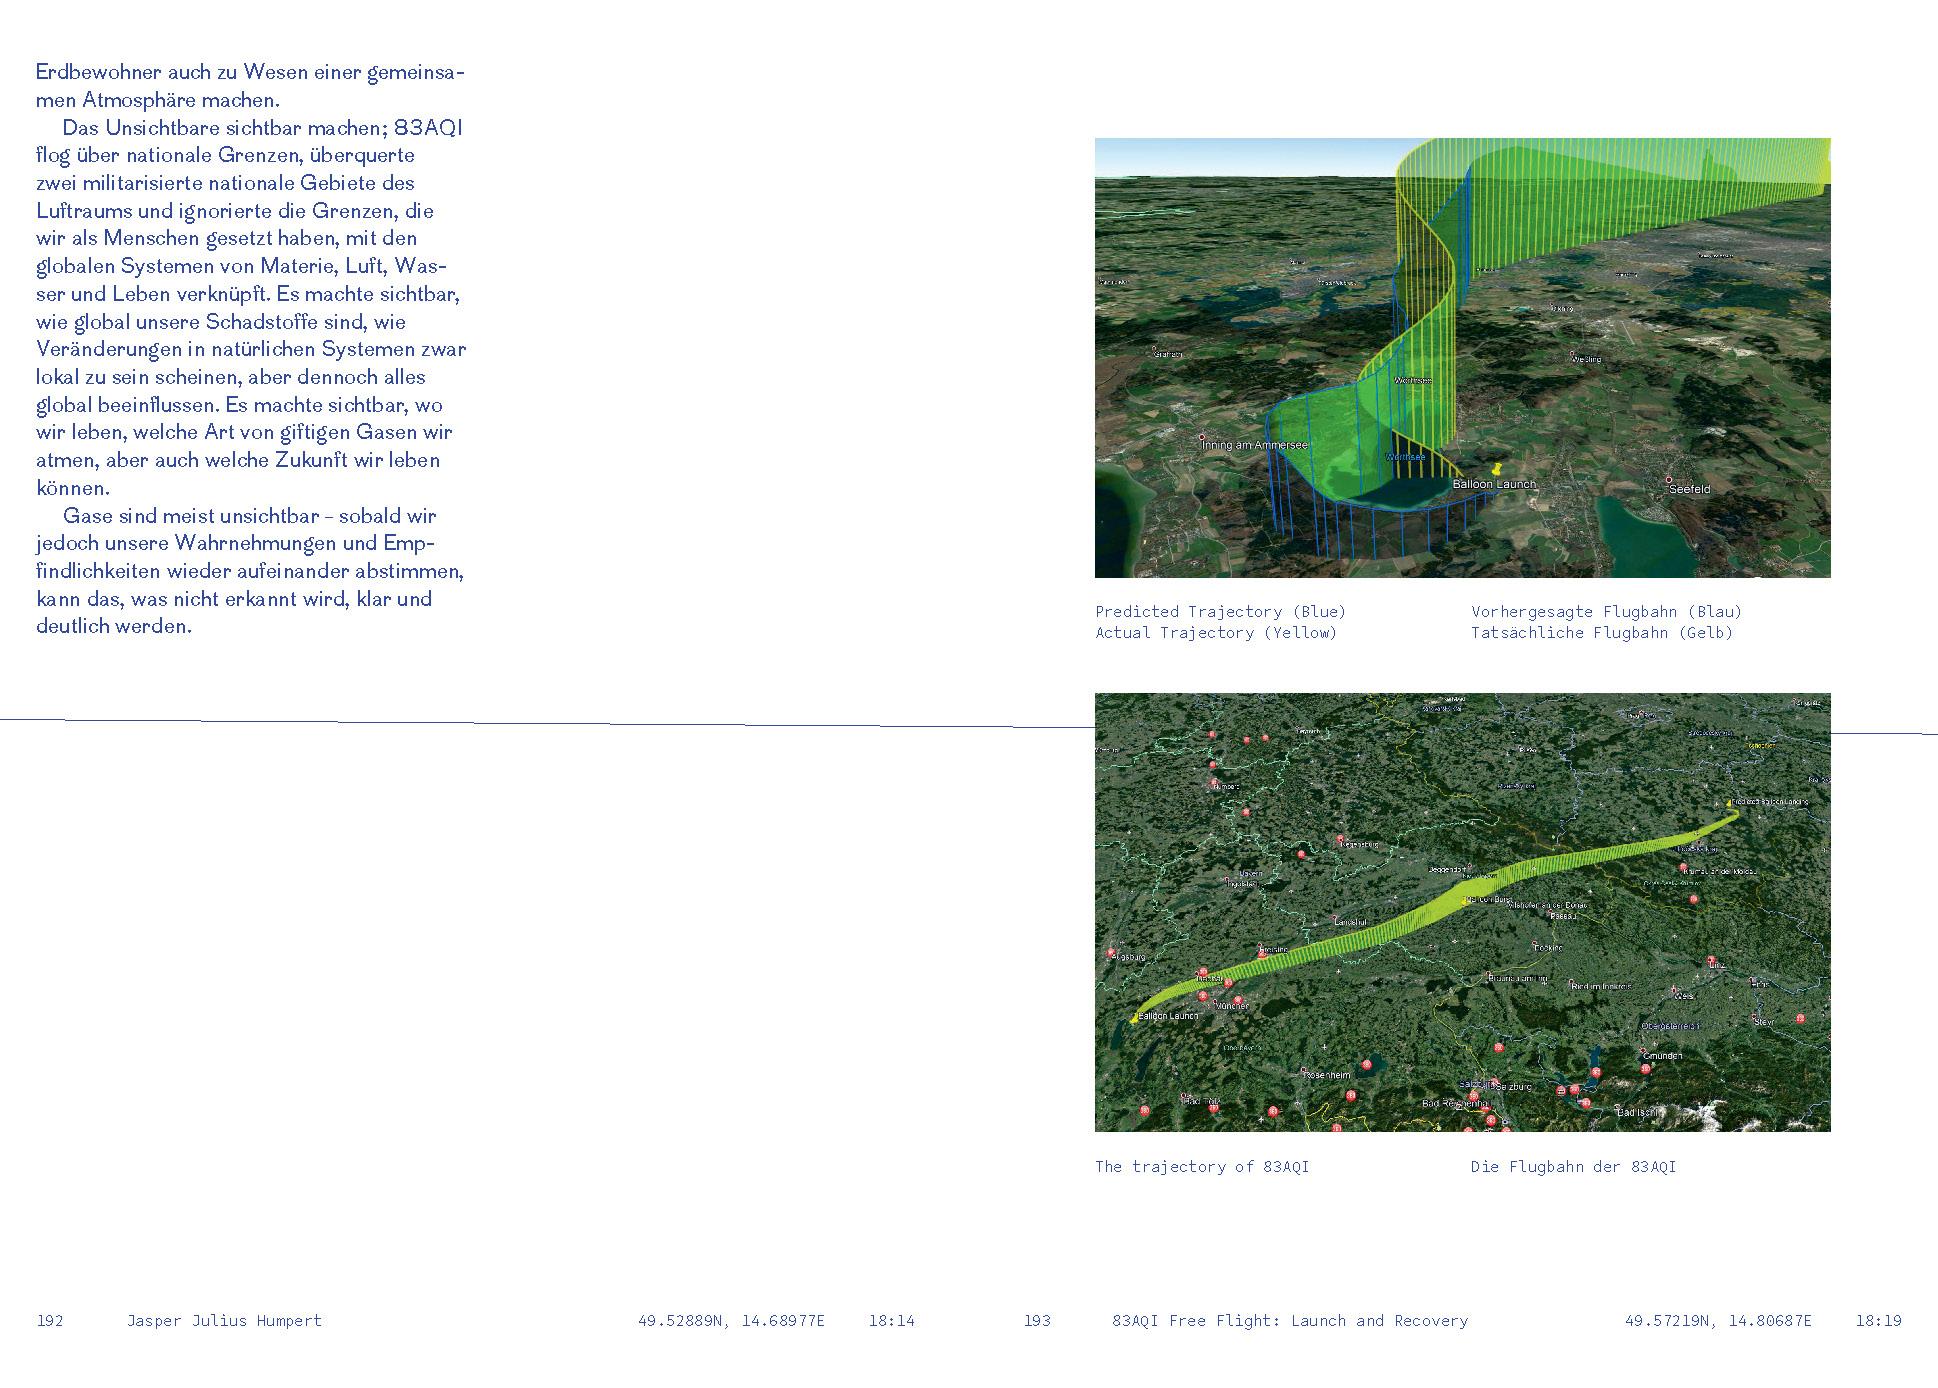 20AE_MovementsfortheAir_Aerocene (1)_Page_097